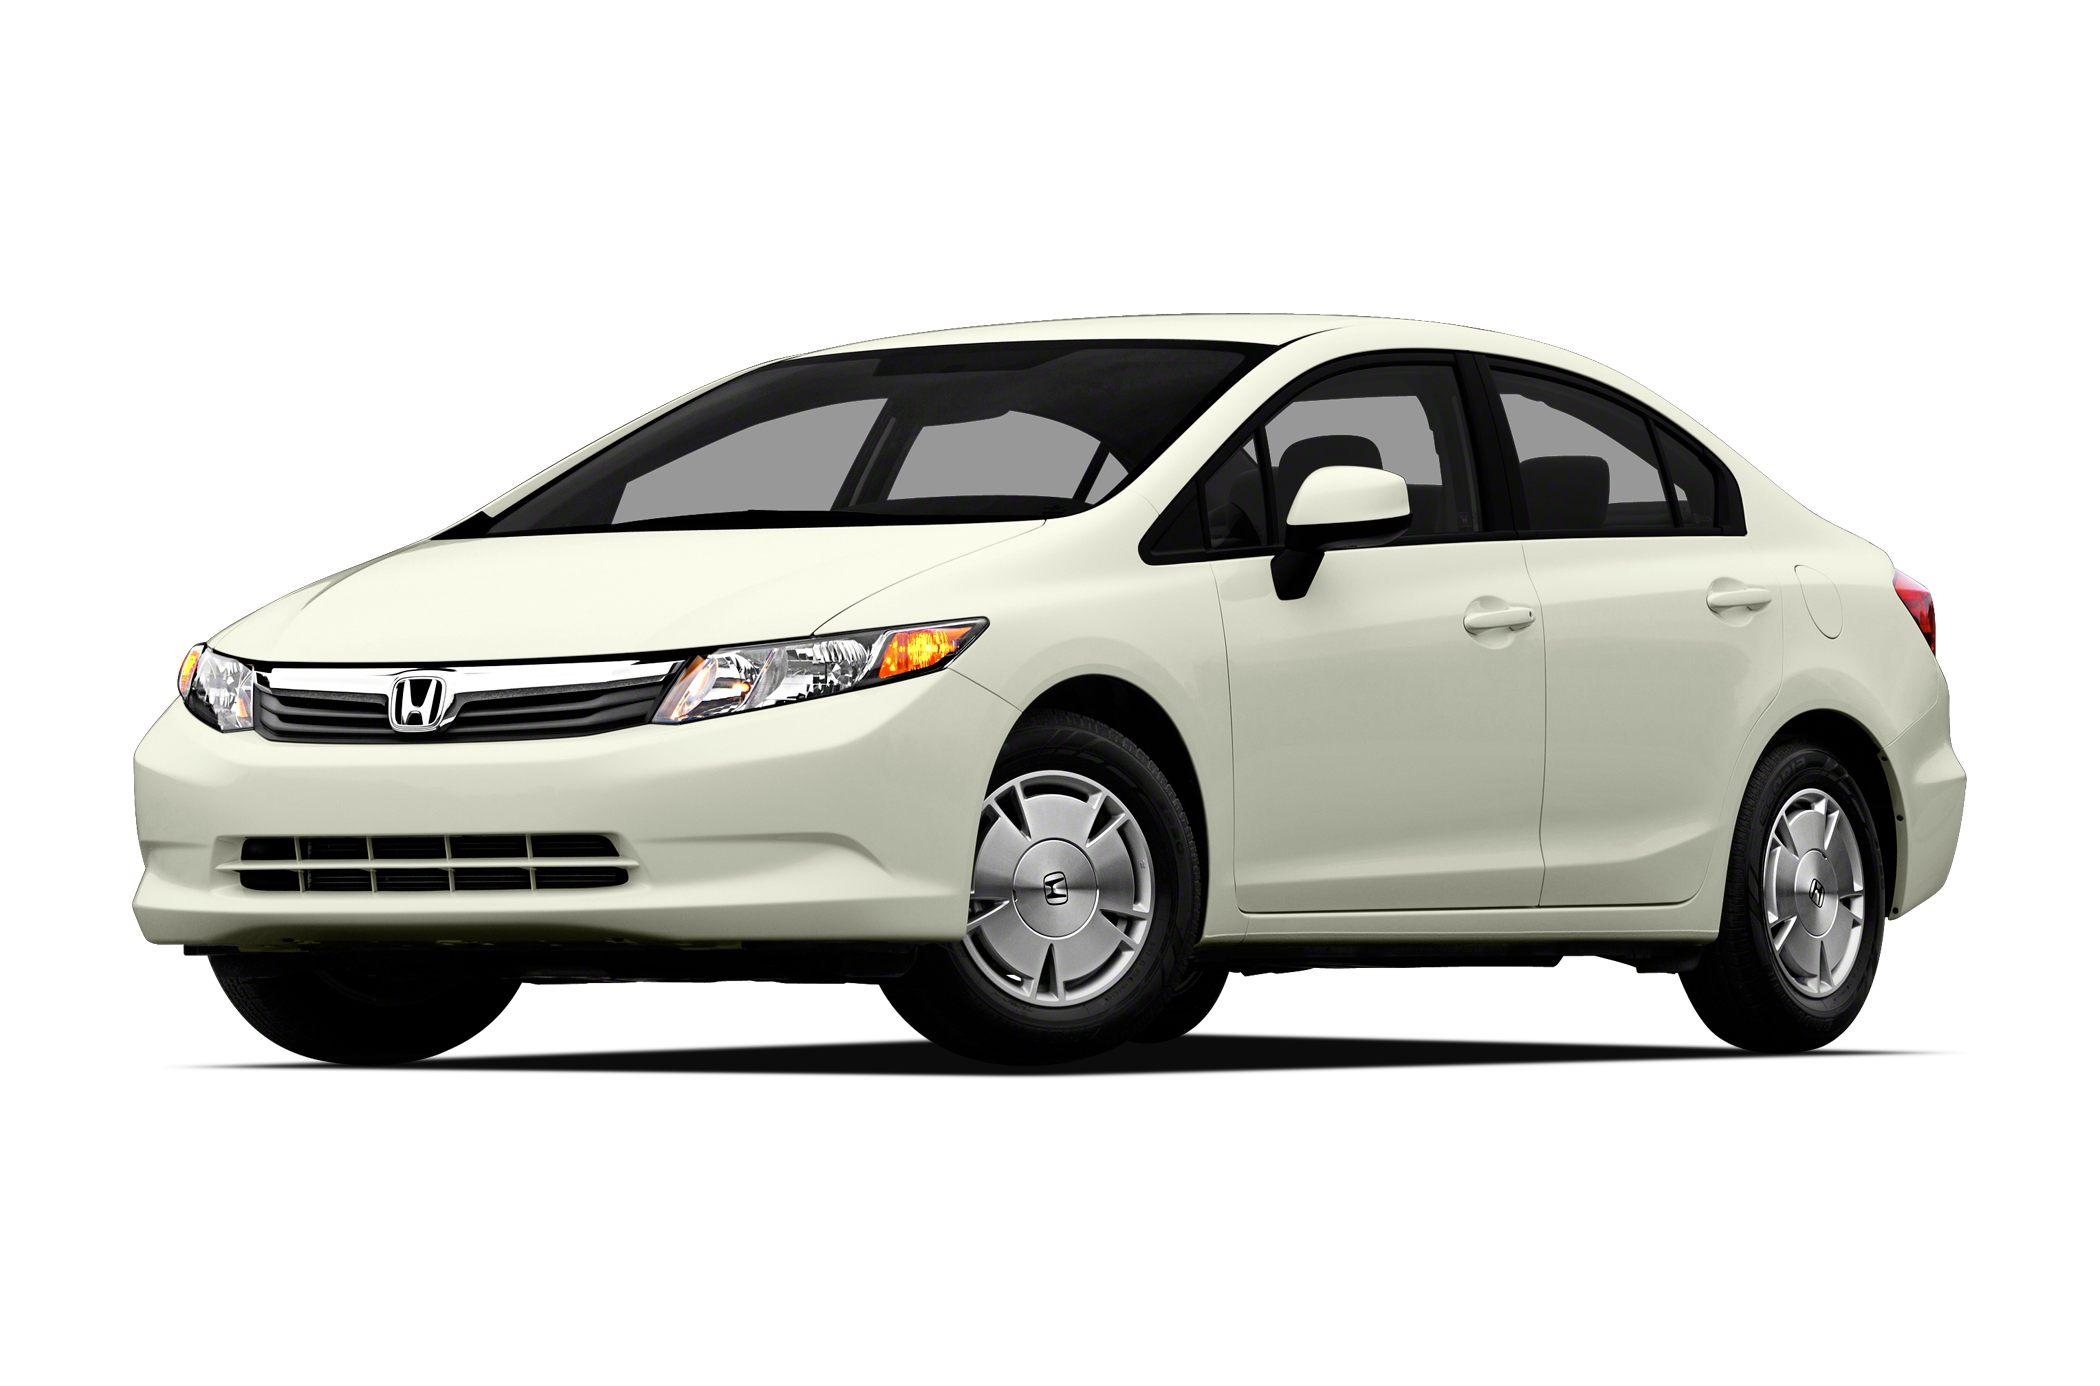 2012 Honda Civic HF Civic HF 4D Sedan 18L I4 SOHC 16V i-VTEC 5-Speed Automatic FWD Taffeta W